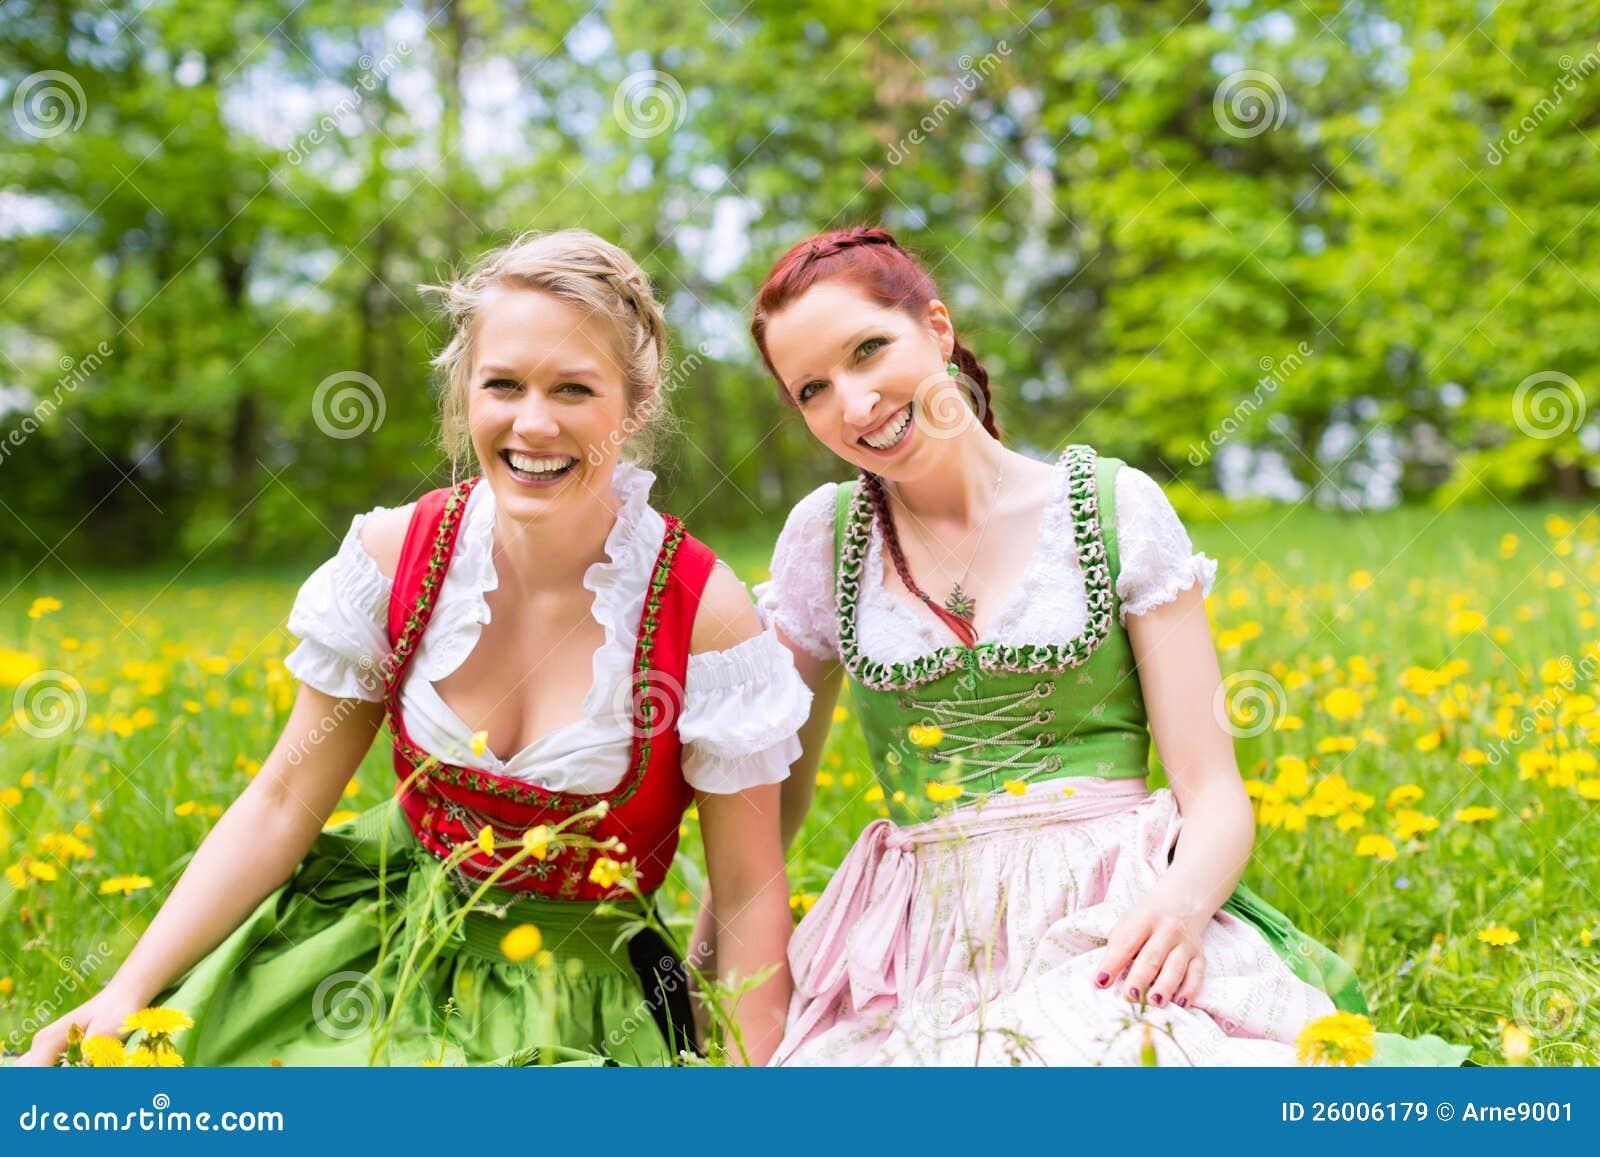 Germany bayern munich girl webcam german - 1 7